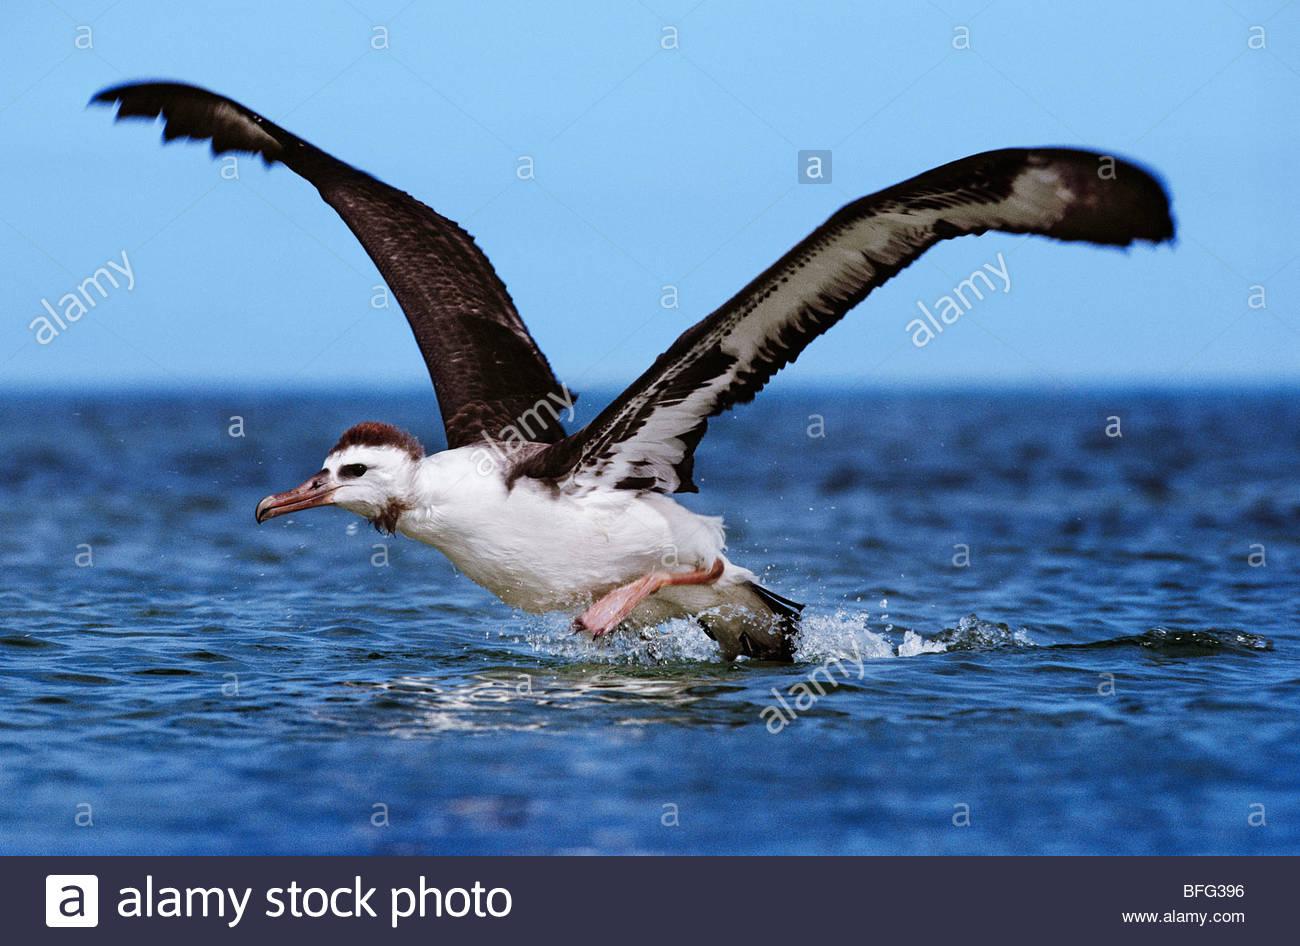 Laysan albatross juvenile taking off from water, Phoebastria immutabilis, Hawaiian Leeward Islands - Stock Image